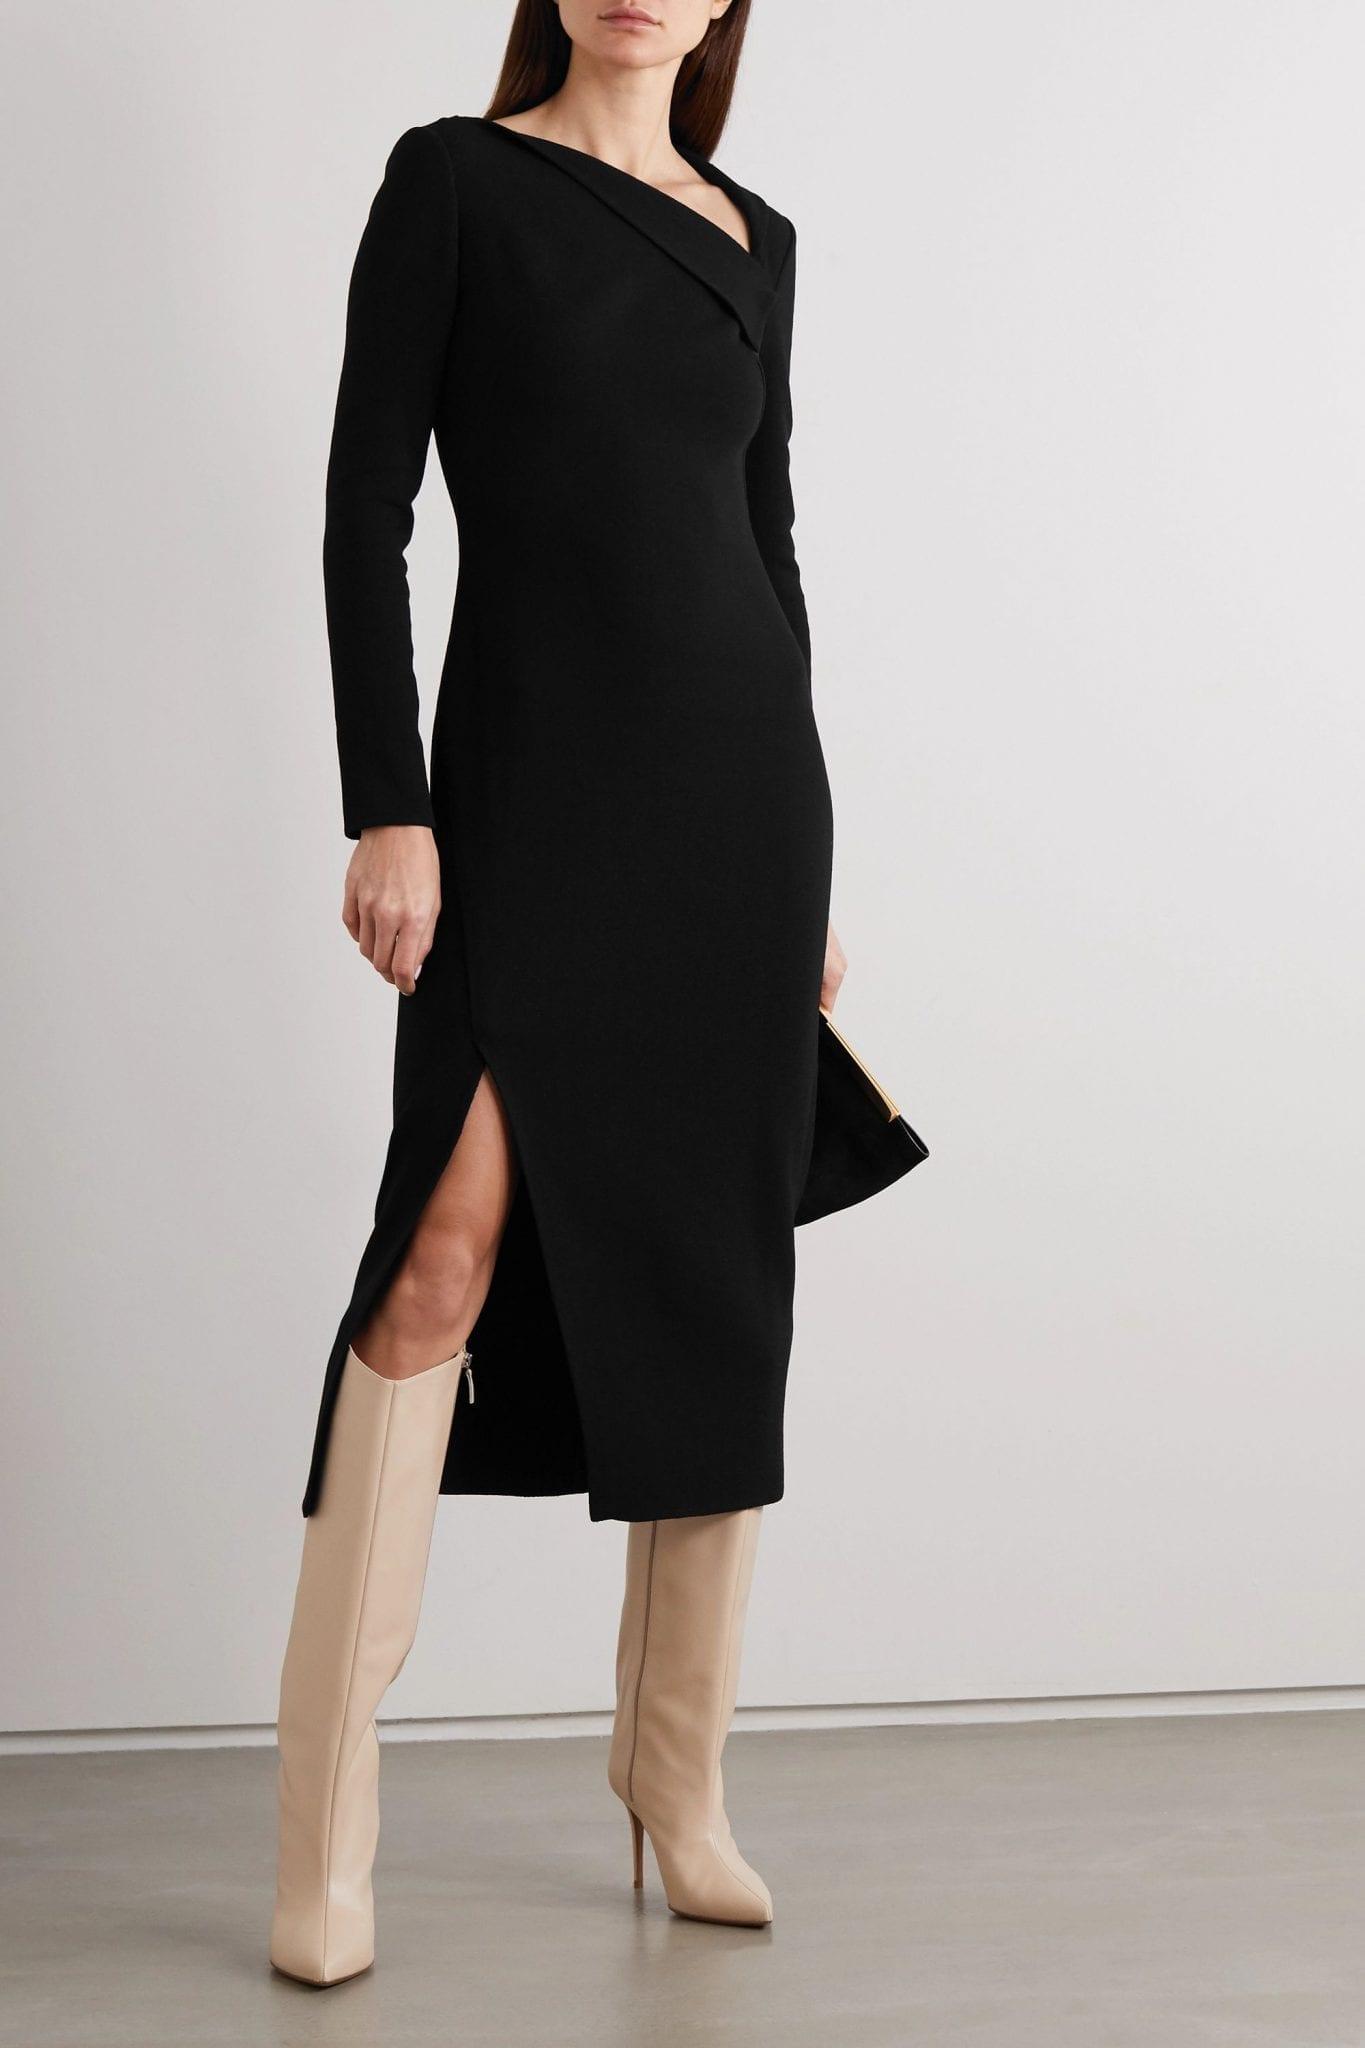 OSCAR DE LA RENTA Draped Stretch-wool Crepe Midi Dress